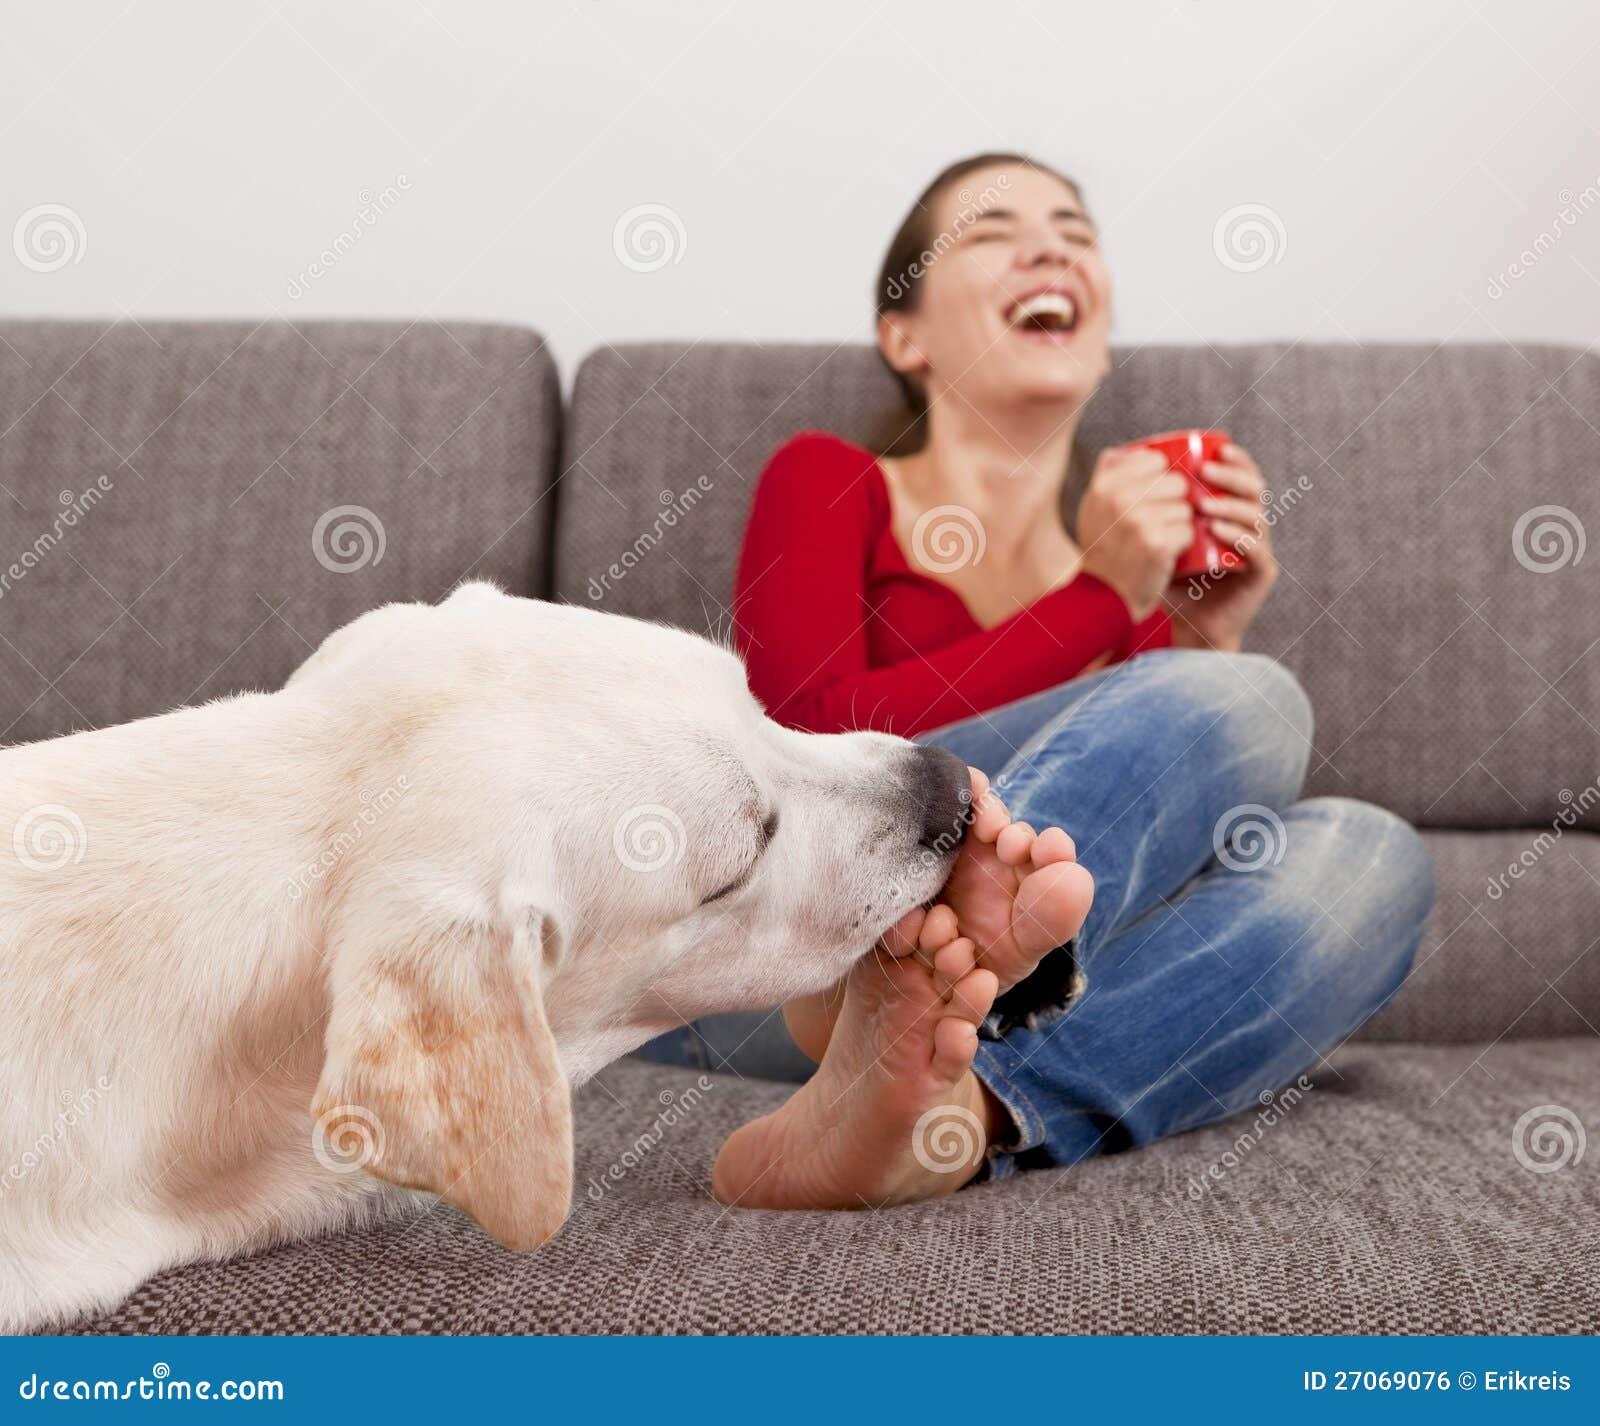 Dog Lick Video